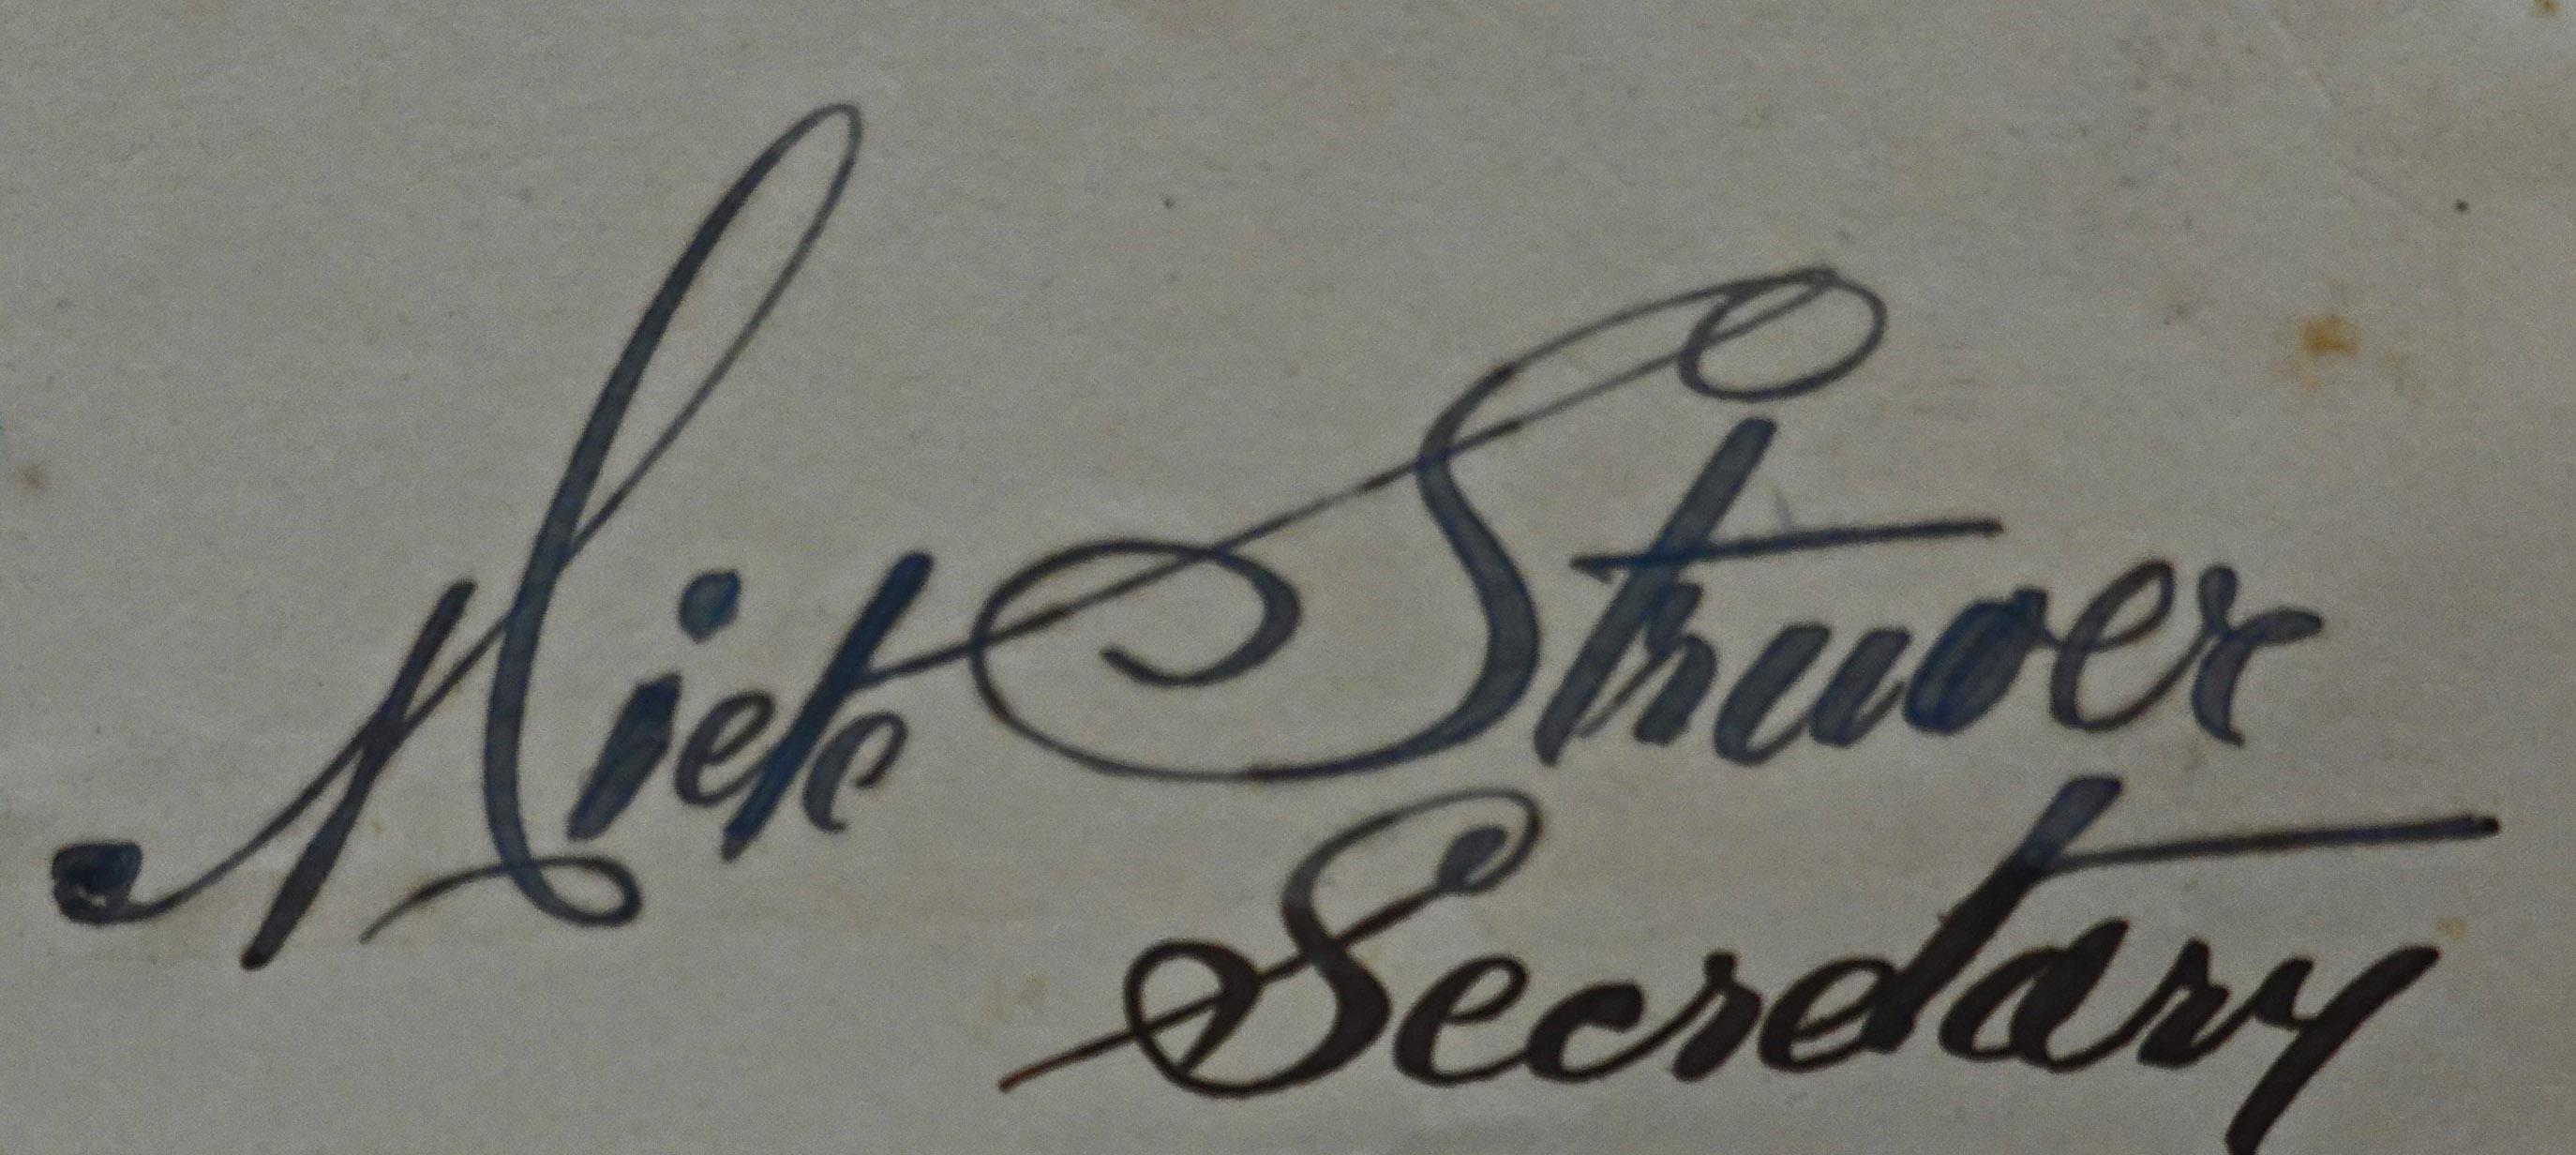 miete struver signature